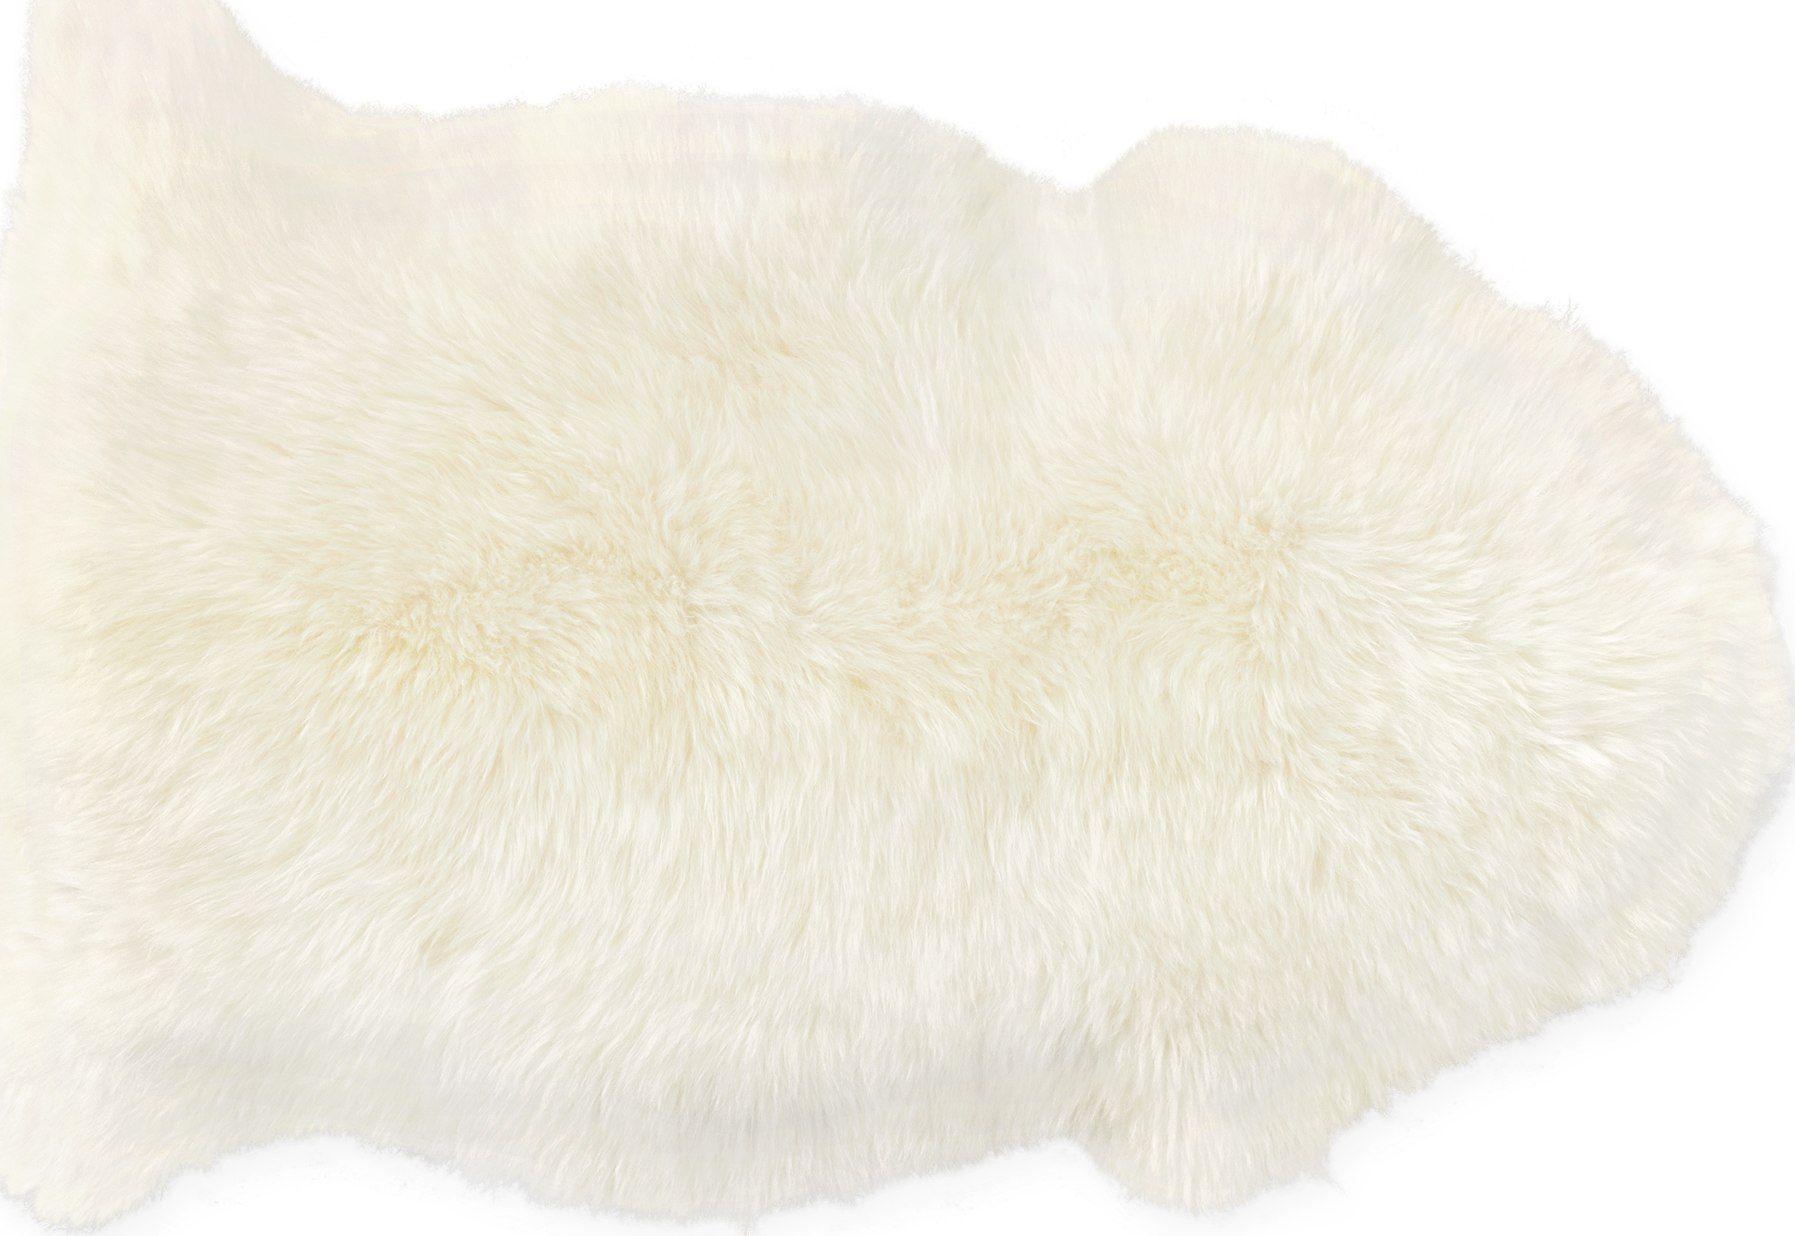 Helgar Sheepskin Cm Ivory From Made Com White New Express